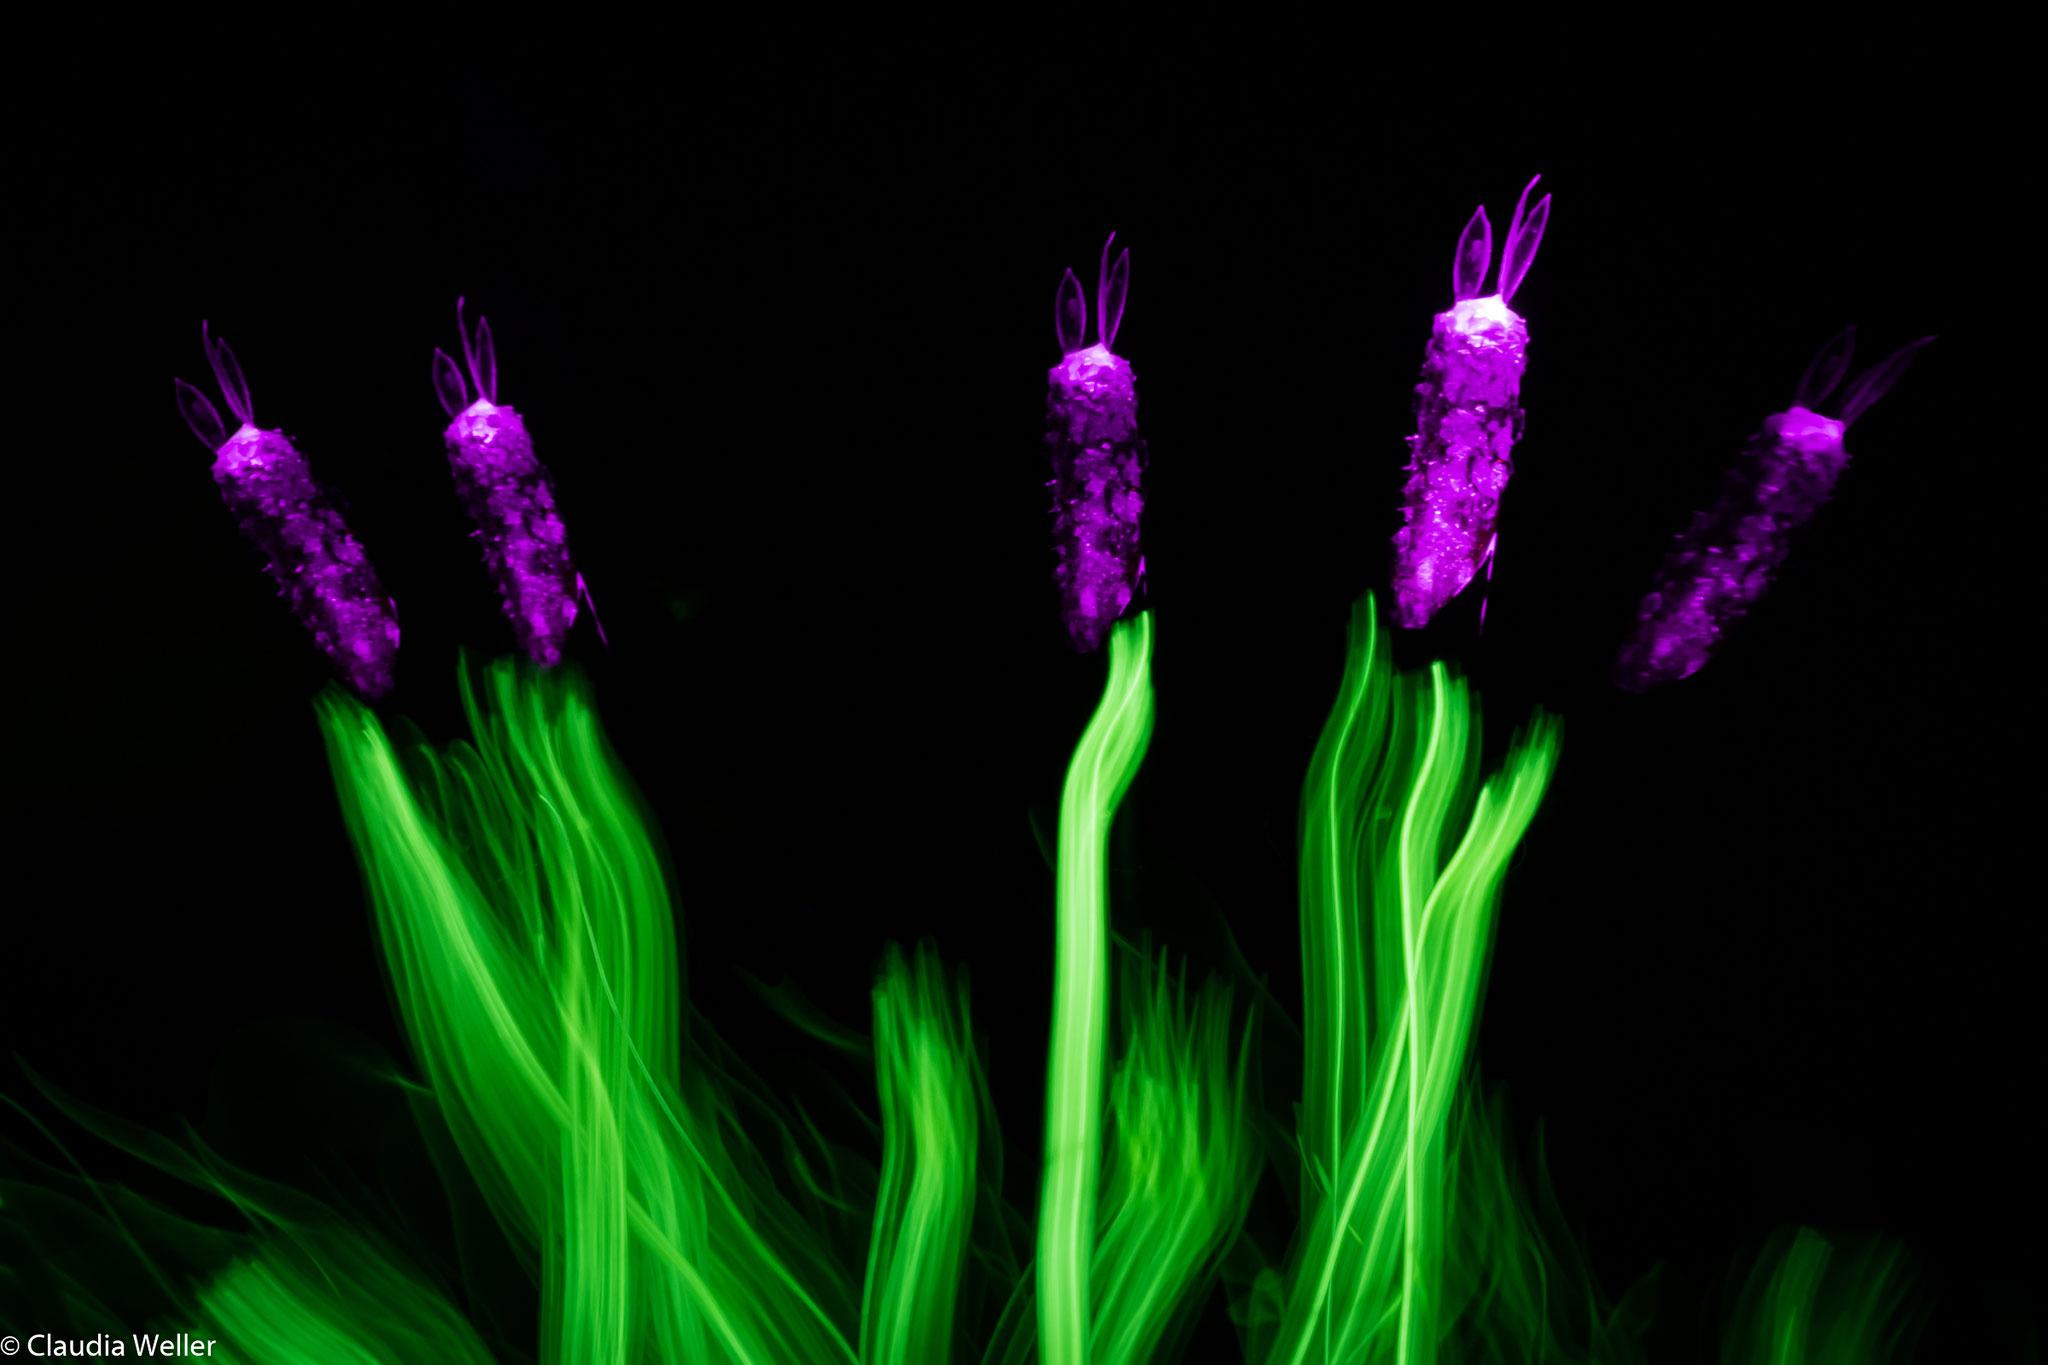 Lavendelblömkes